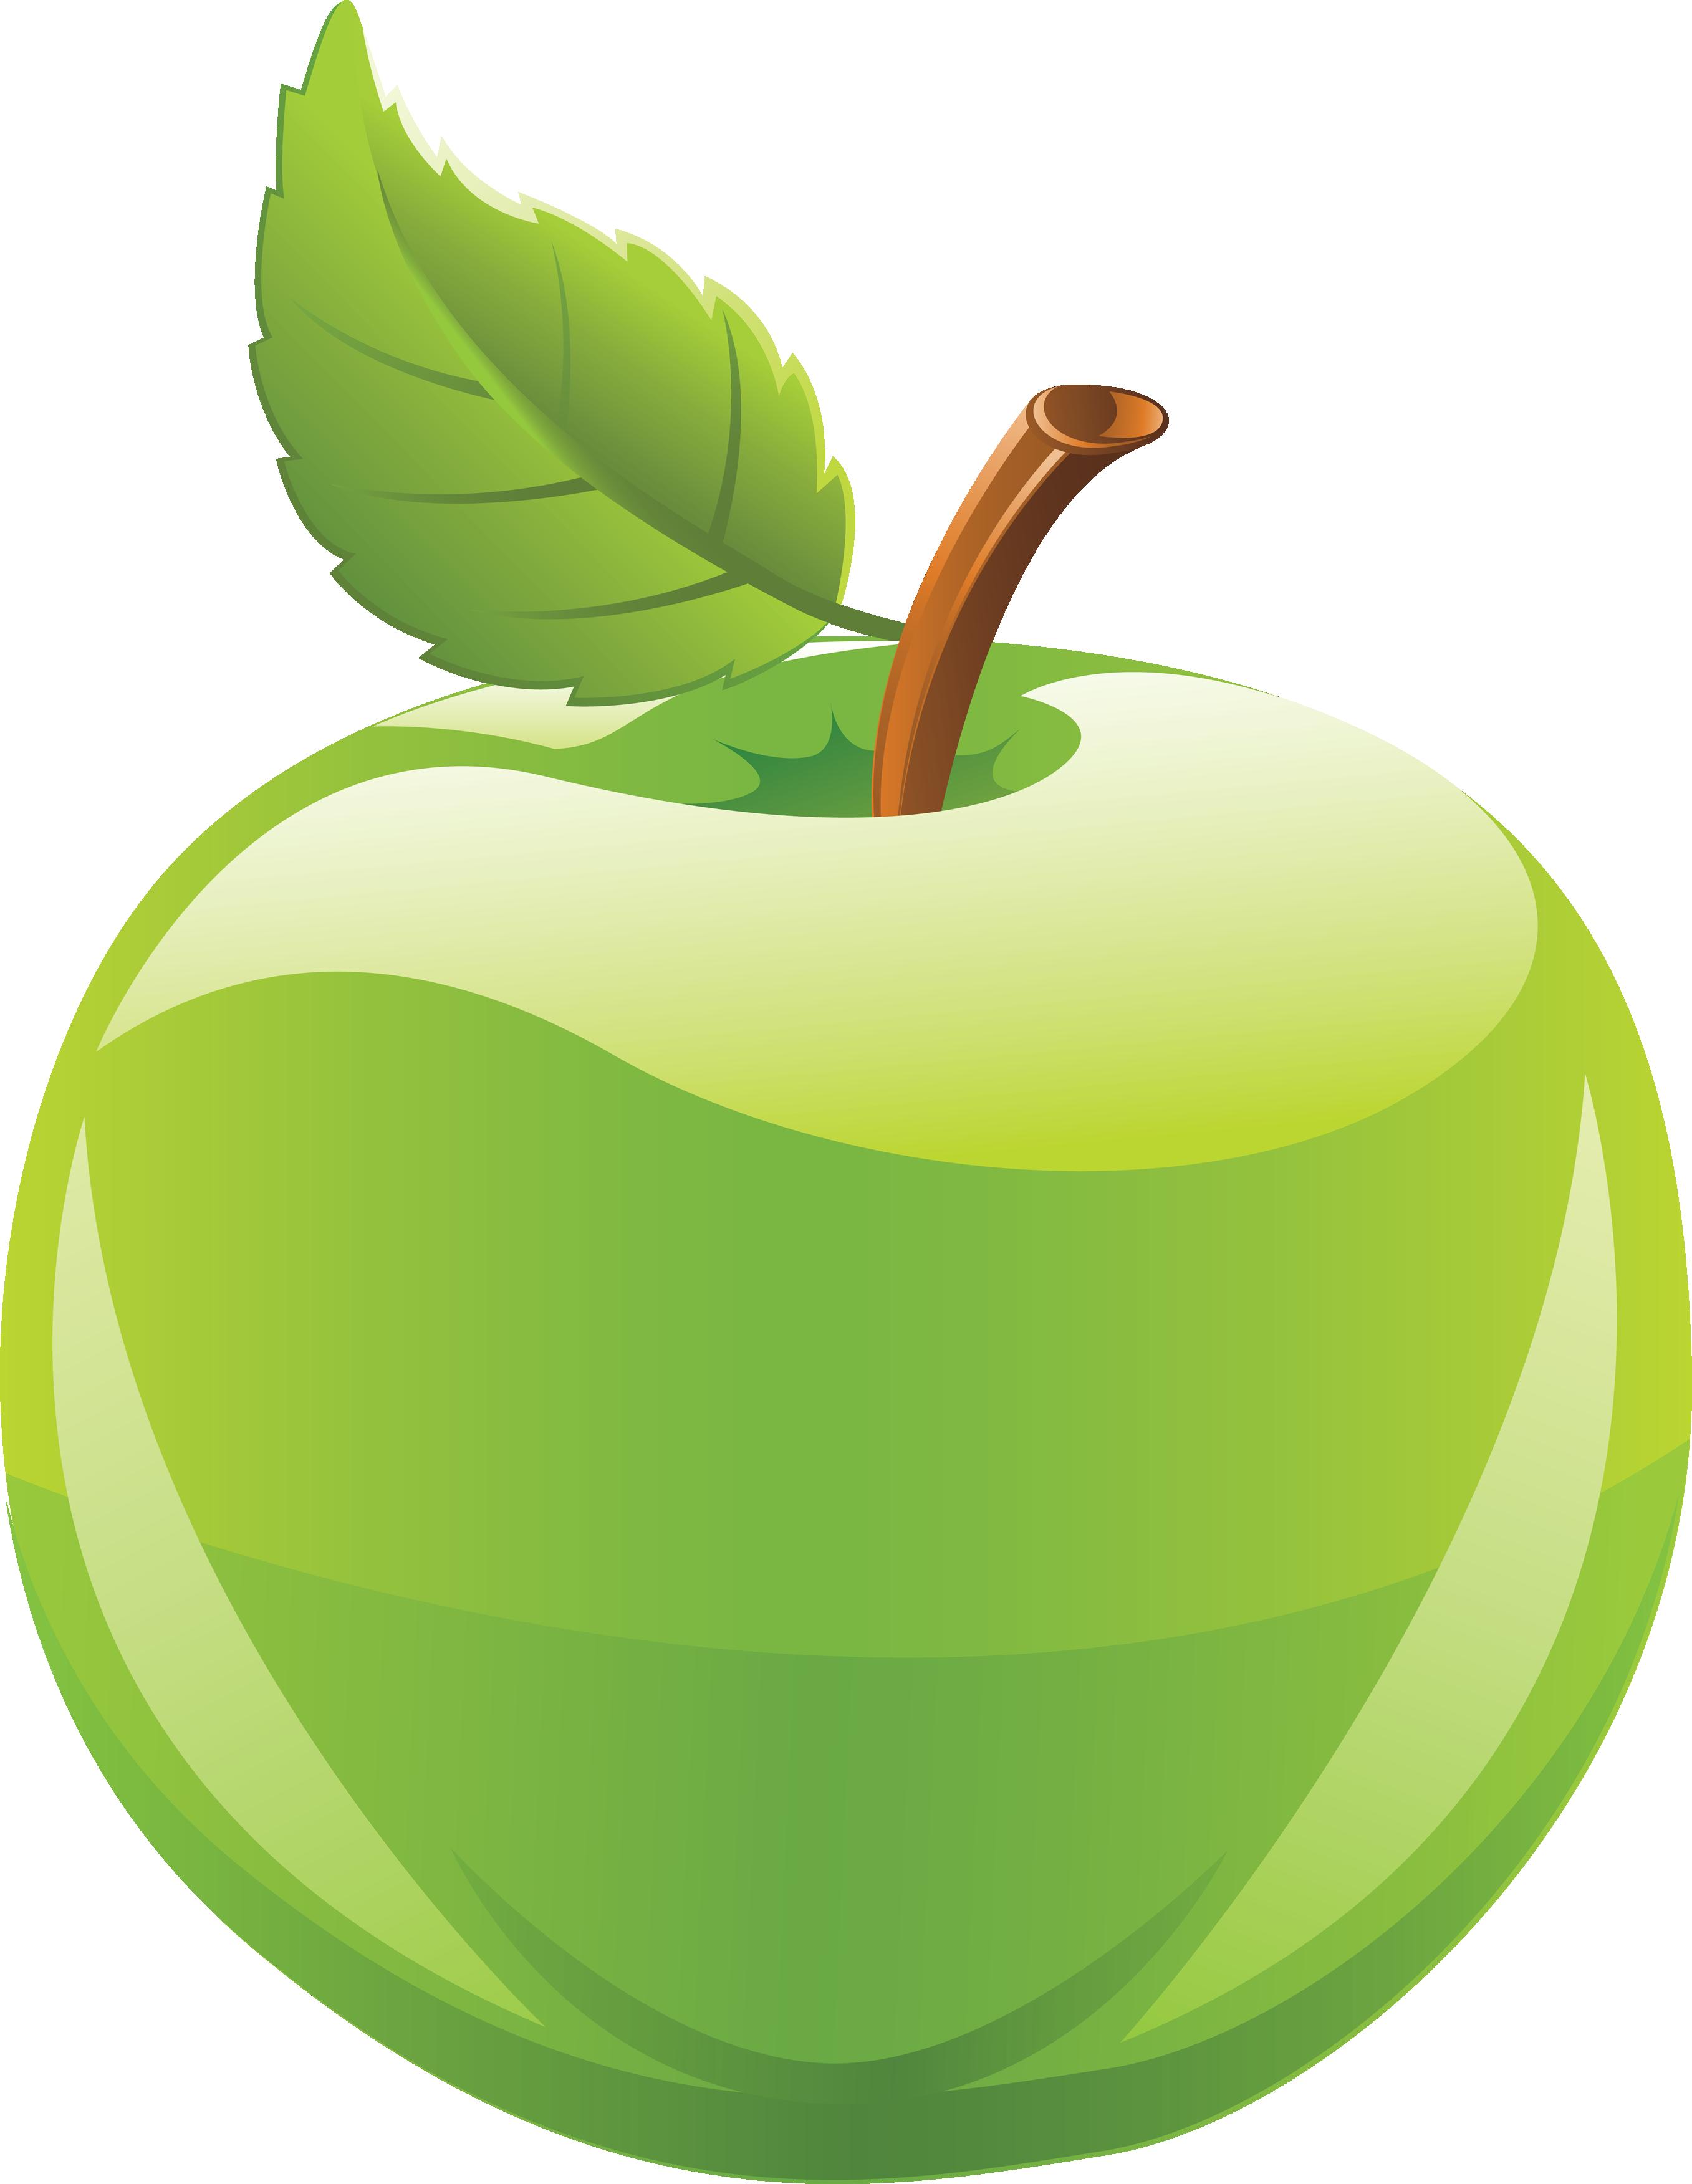 Green Apple S Png Image Green Apple Apple Vegetable Harvest